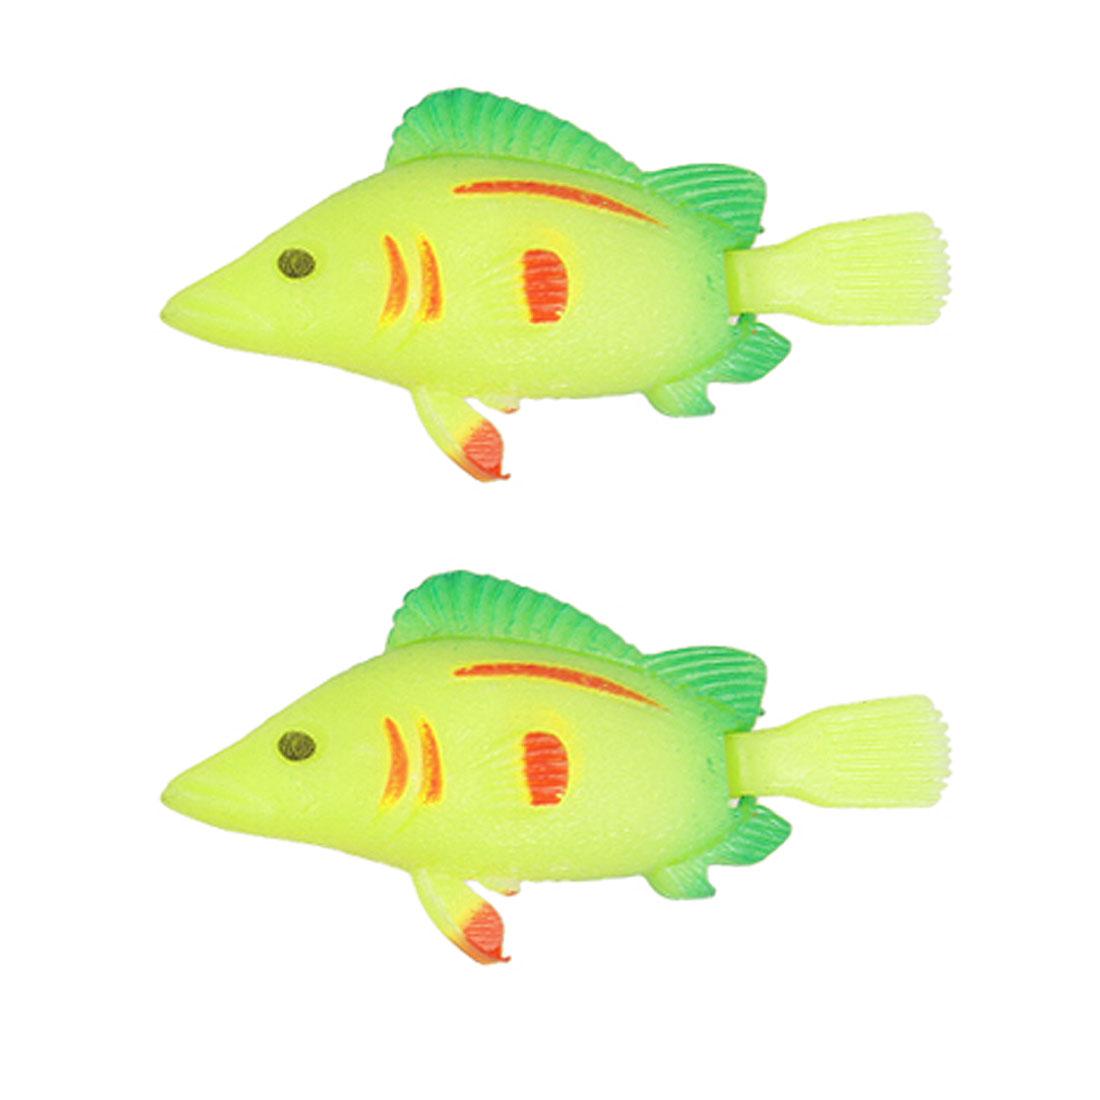 Unique Bargains 2 Pcs Aquarium Water Floating Swing Tail Fake Fish Yellow